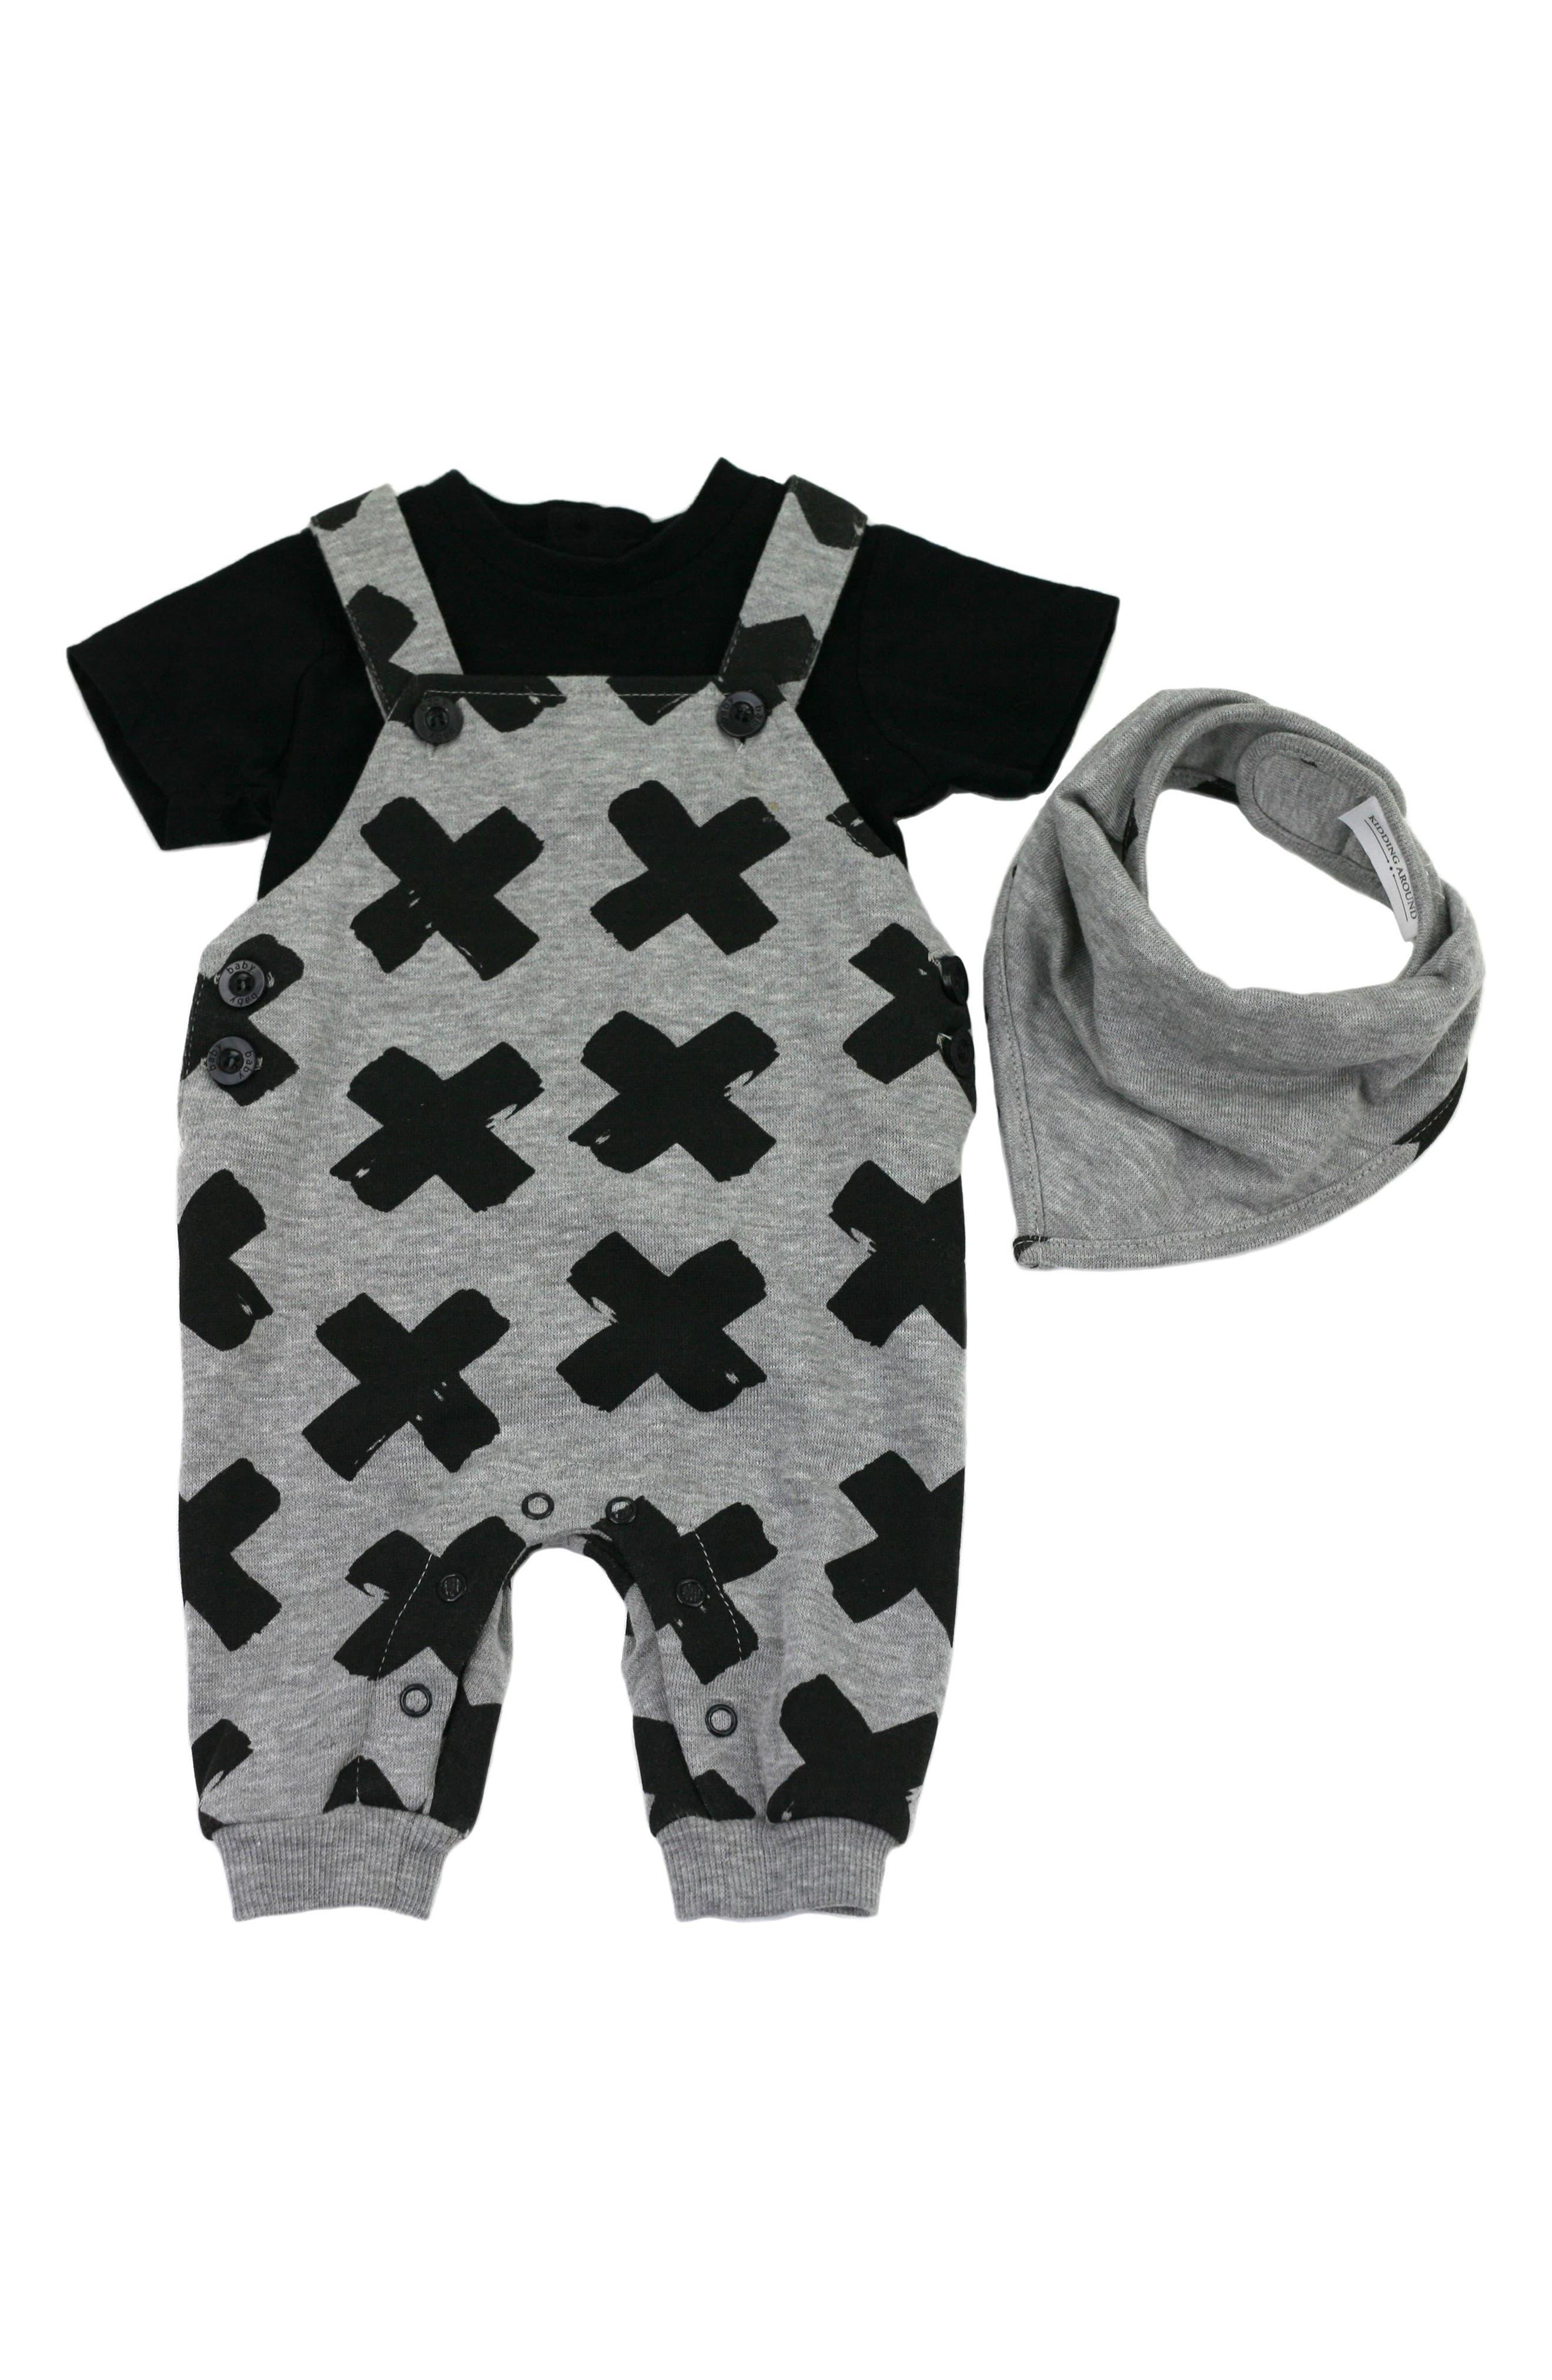 Alternate Image 1 Selected - Kidding Around T-Shirt & Overalls Set (Baby)